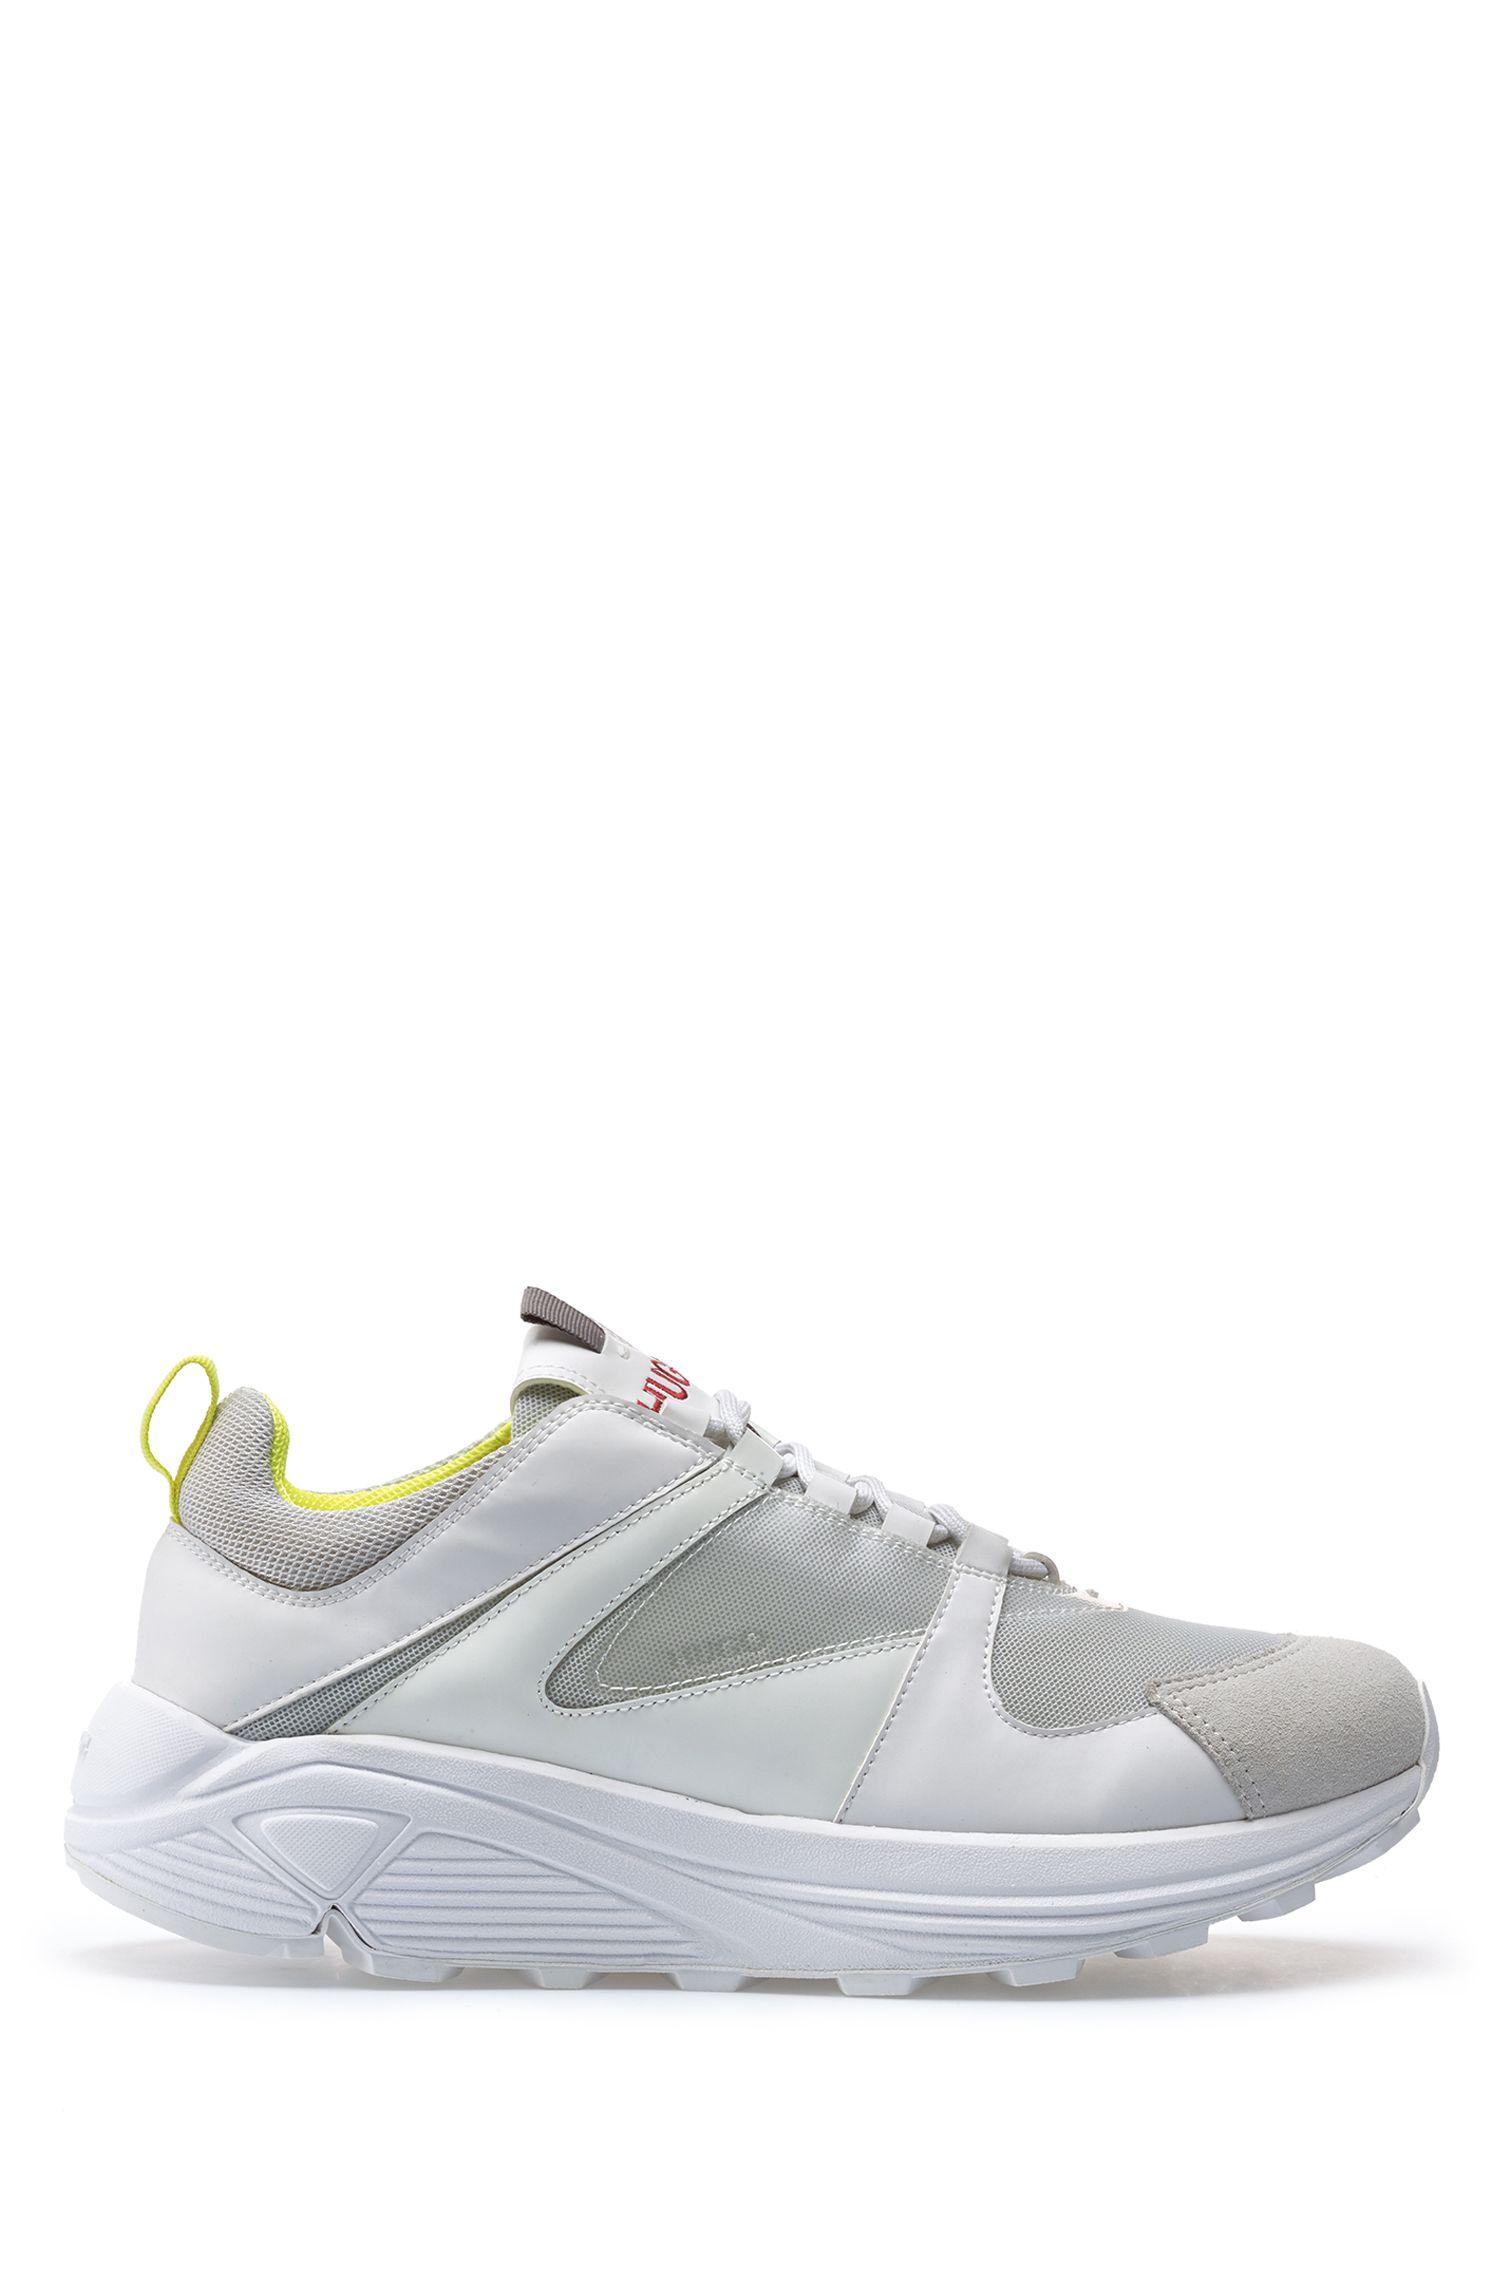 Running-inspired hybrid sneakers with Vibram sole, White